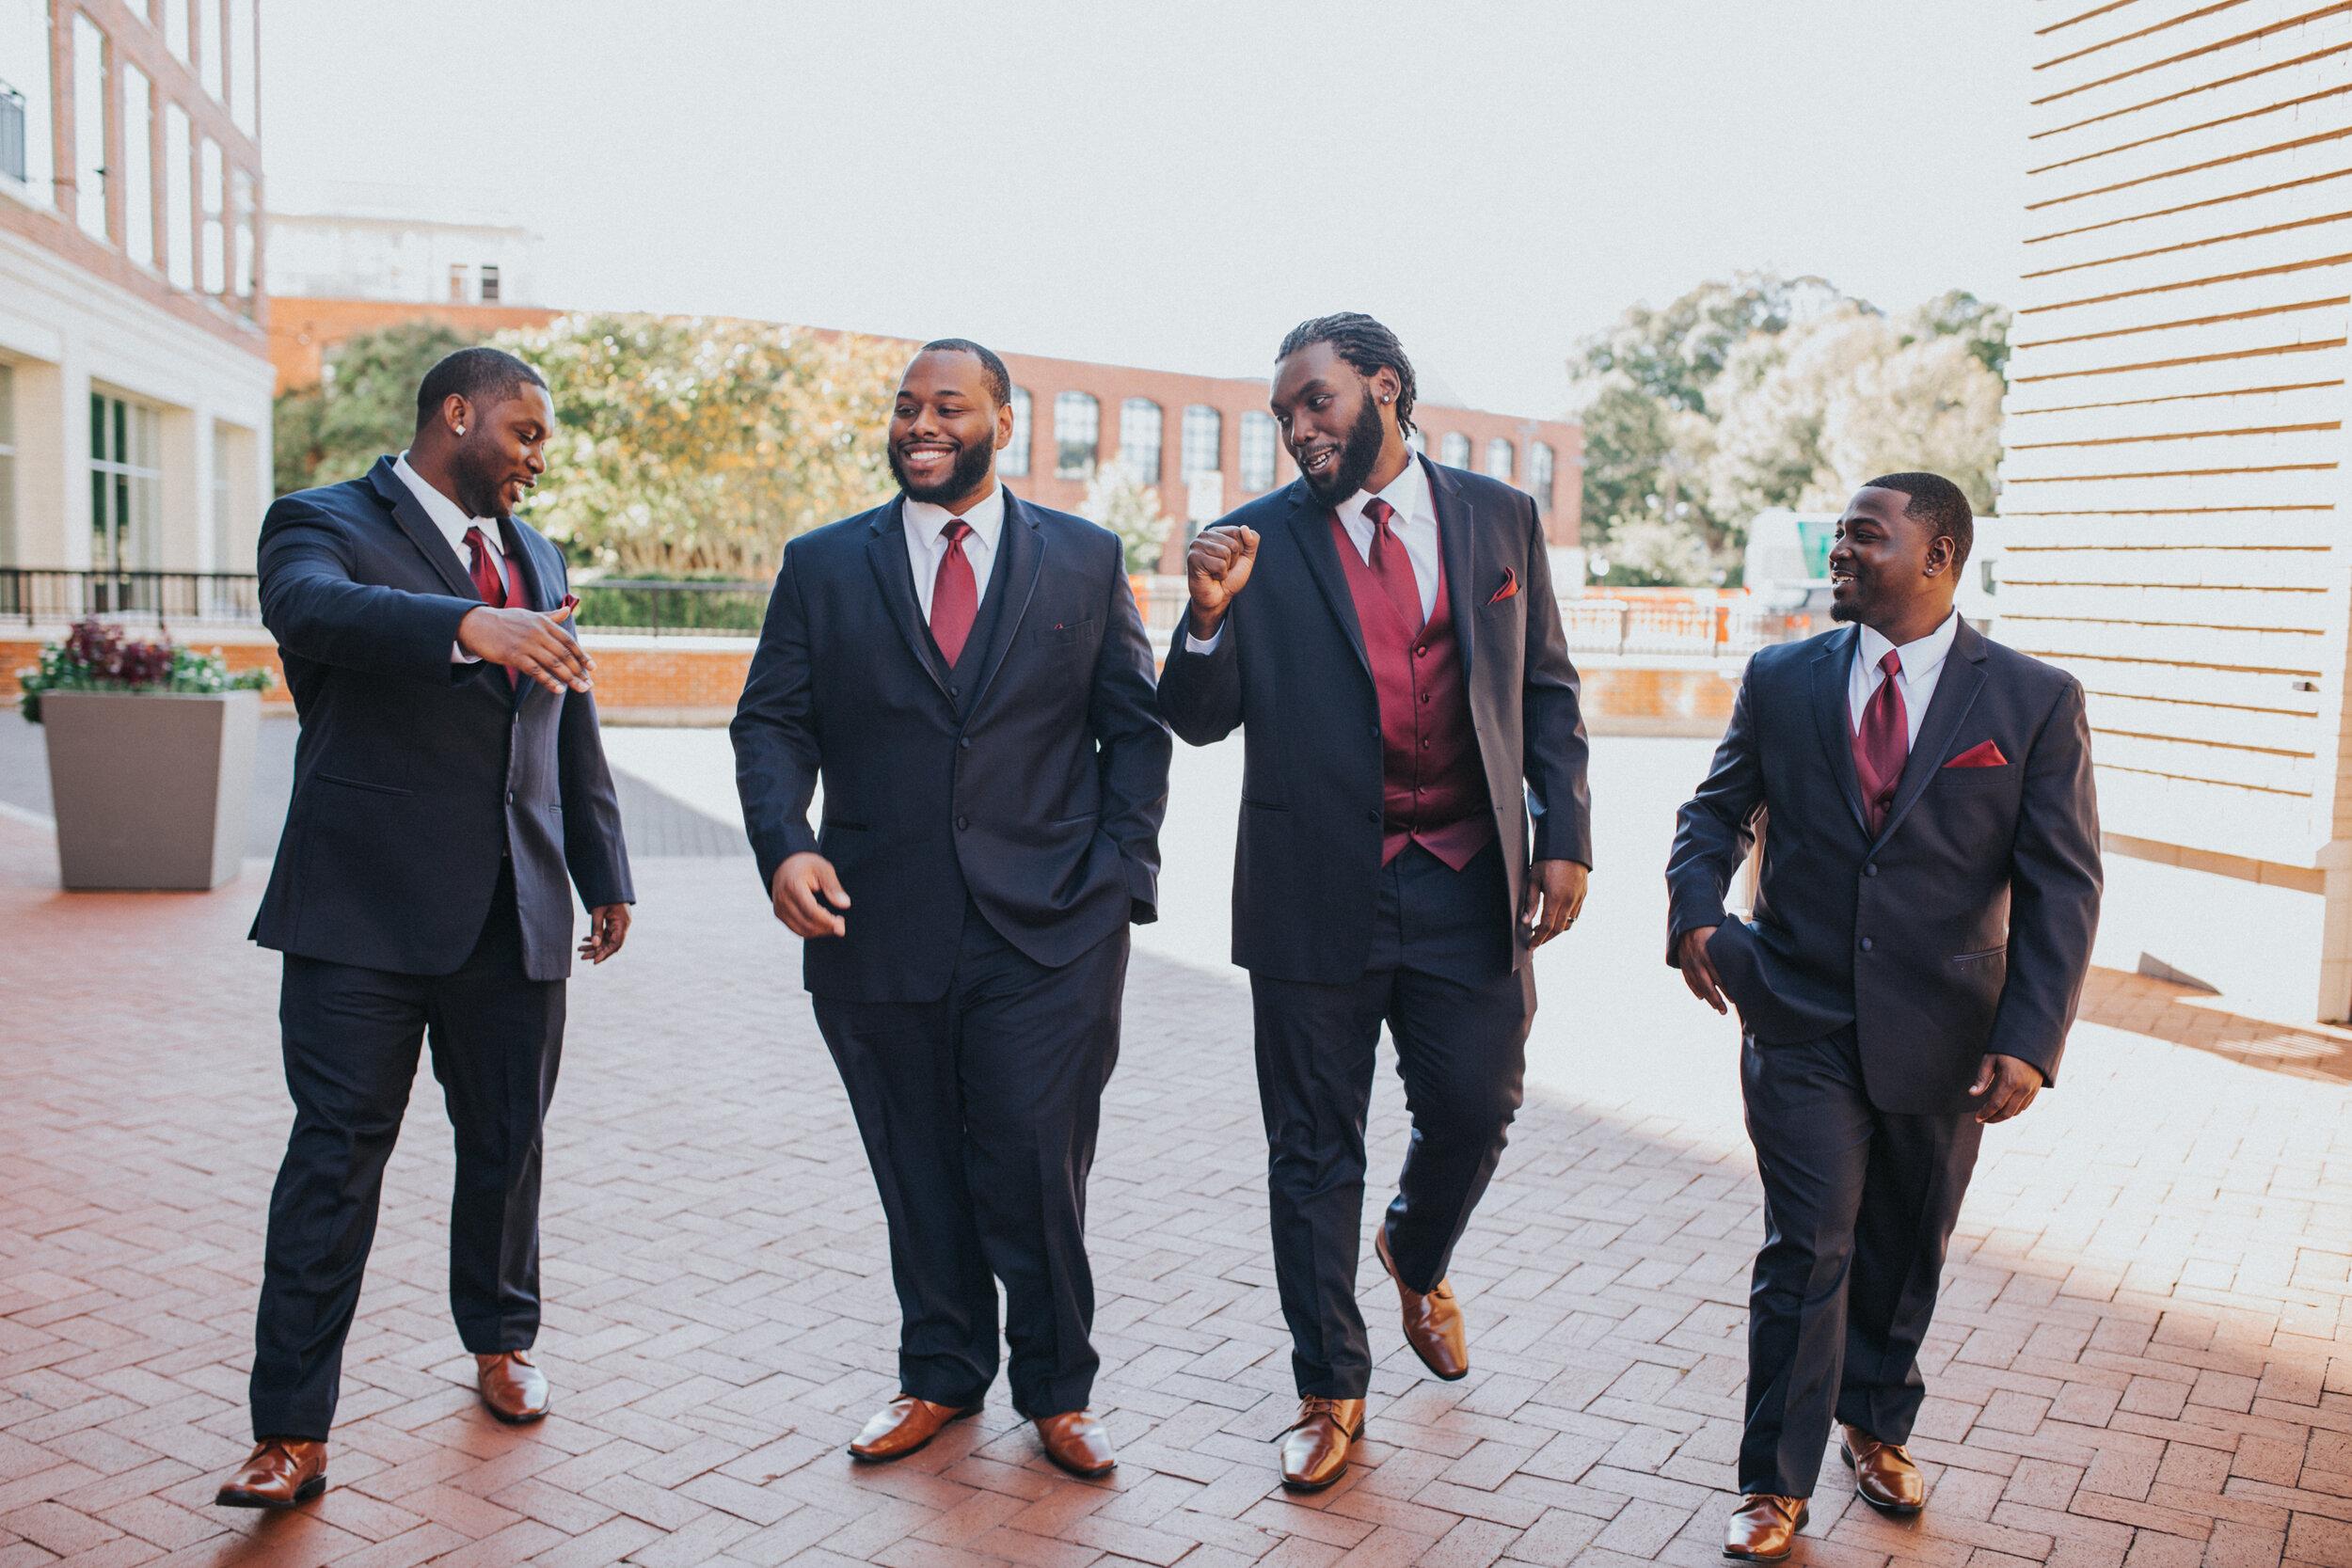 Black Groomsmen at Artisan Traders Wedding- Greenville SC